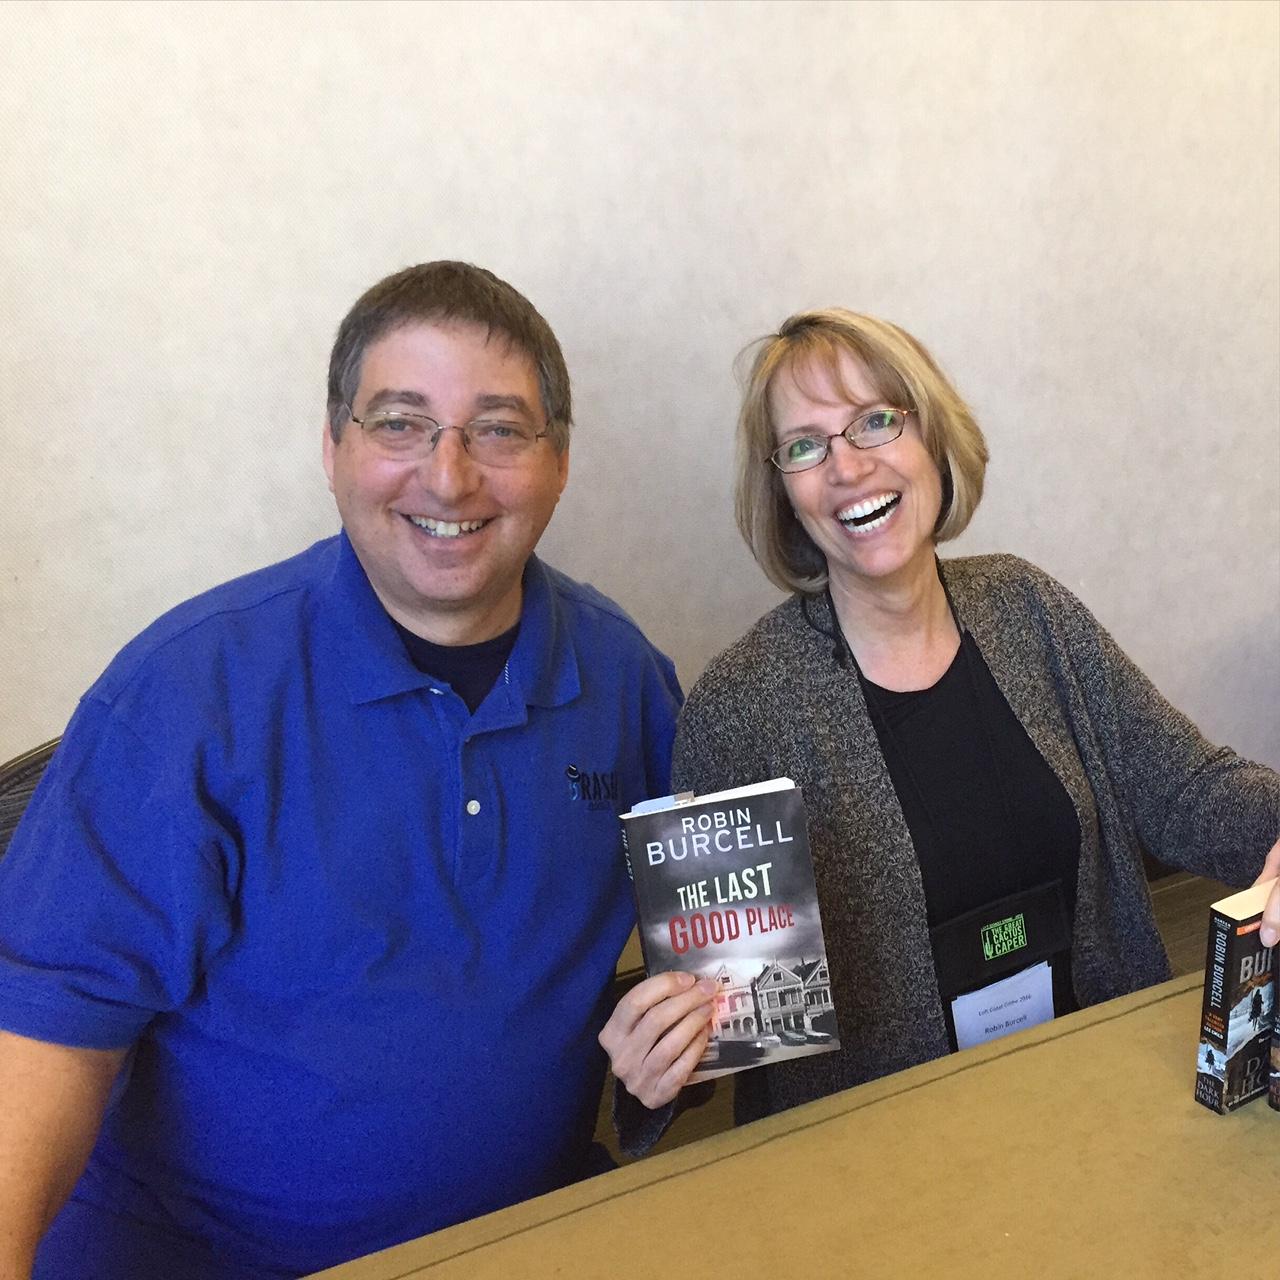 Lee Goldberg and Robin Burcell